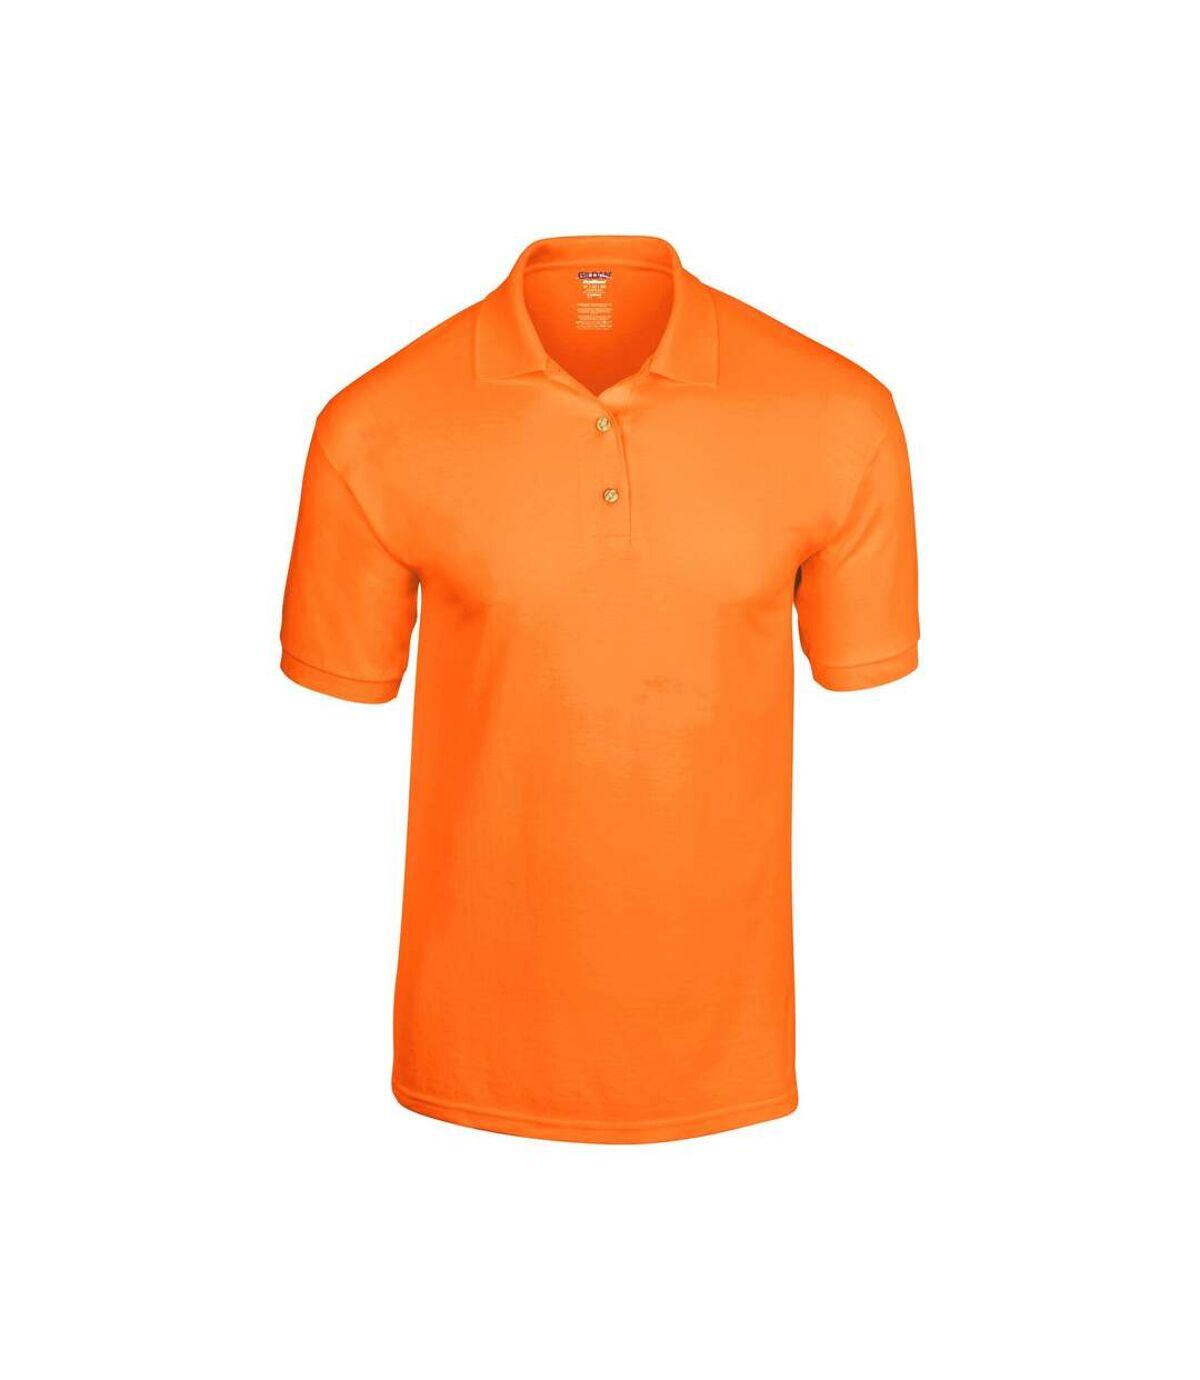 Gildan Adult DryBlend Jersey Short Sleeve Polo Shirt (Royal) - UTBC496